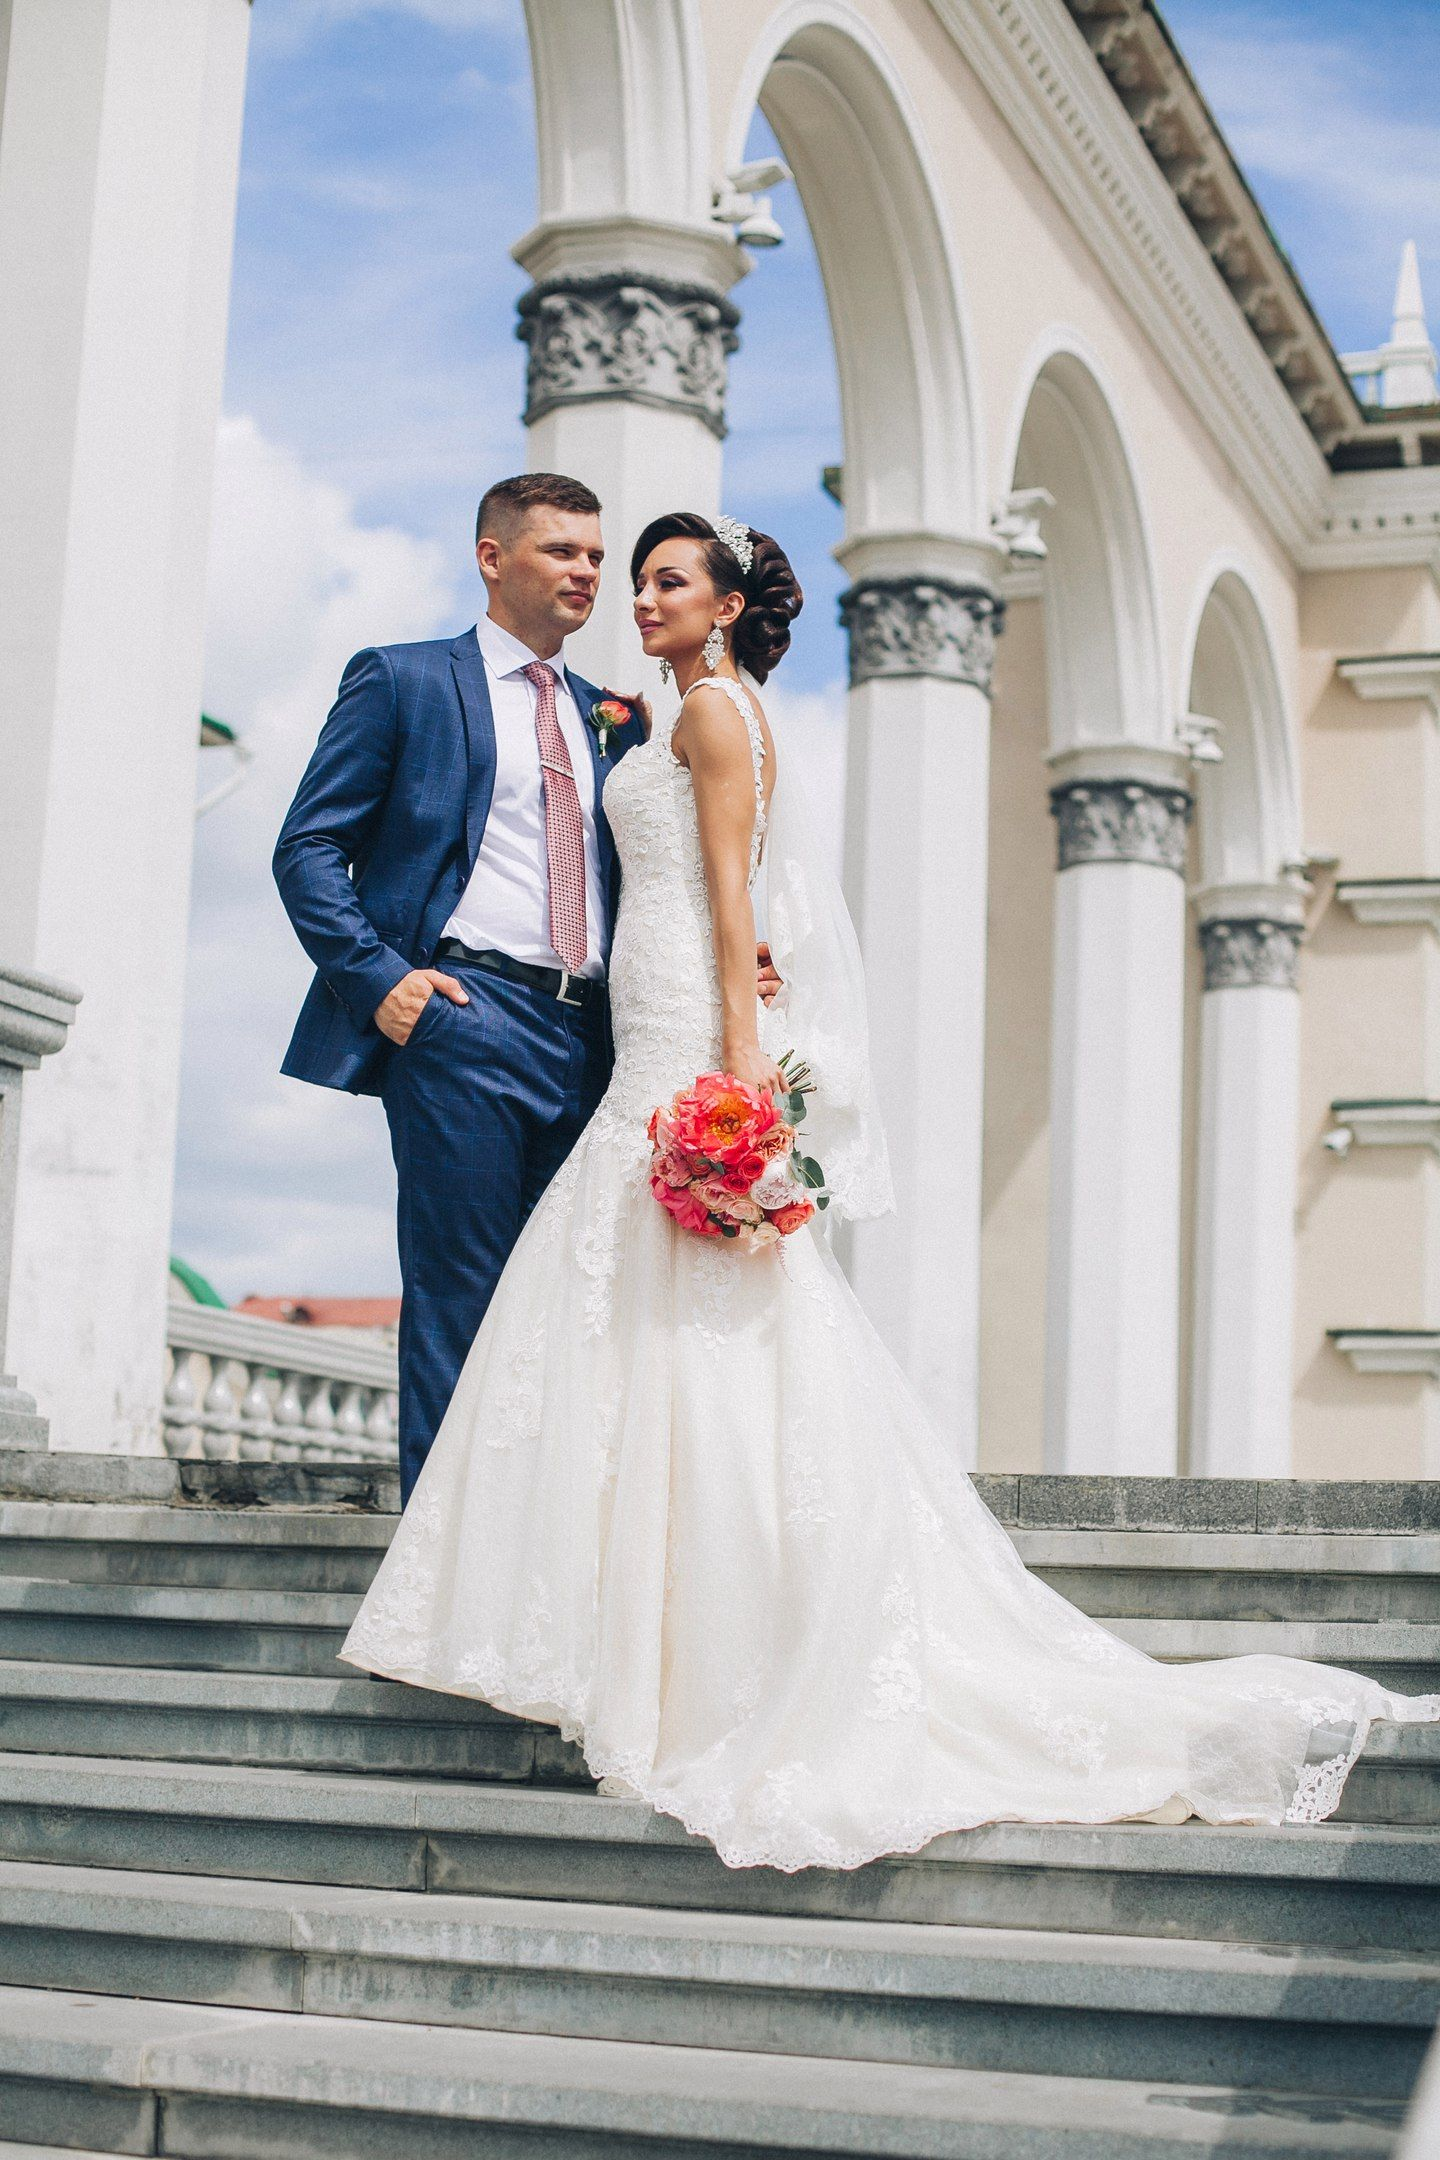 фото на свадьбу улан удэ избыток красок